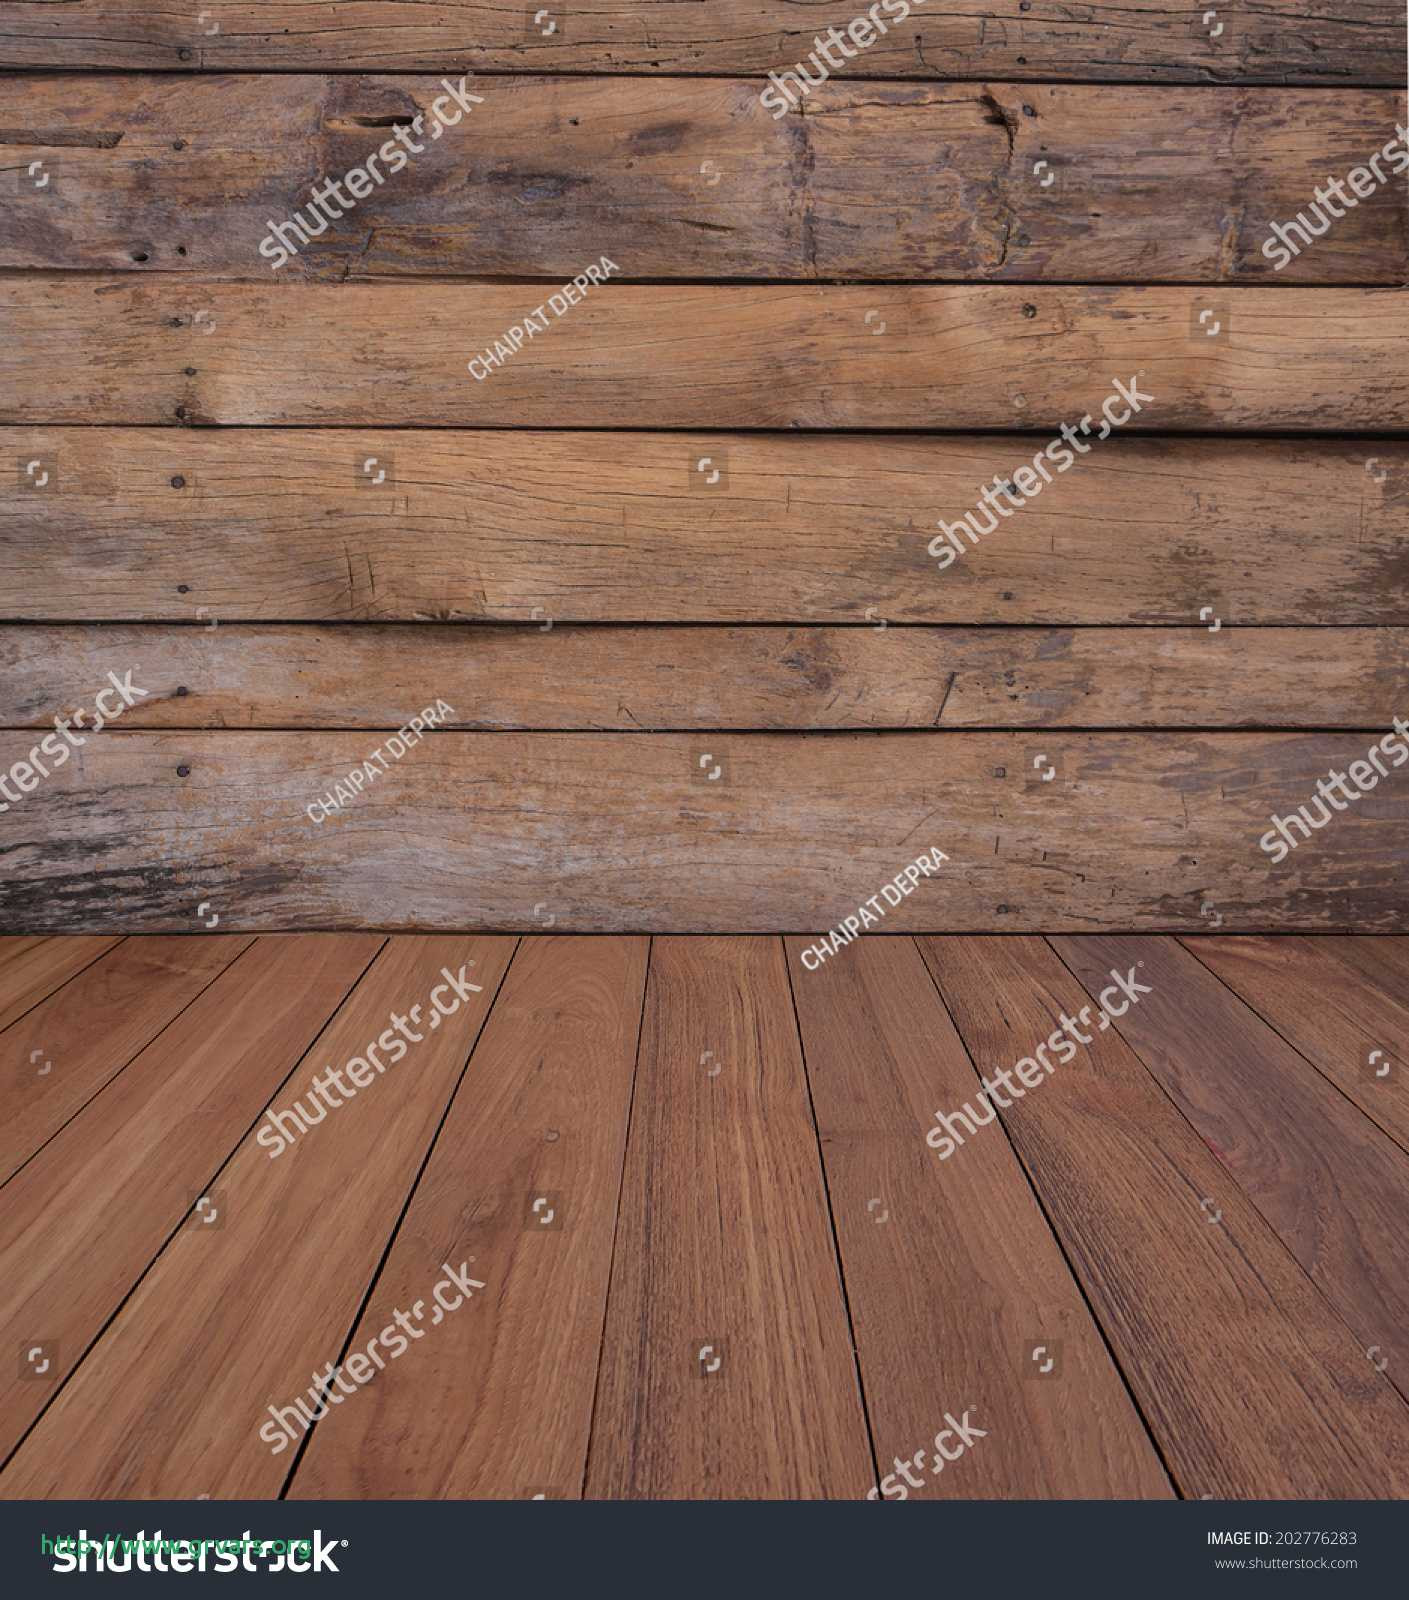 gaps in hardwood floors of 18 beau what type of hardwood floor do i have ideas blog inside od wood wall and wood floor